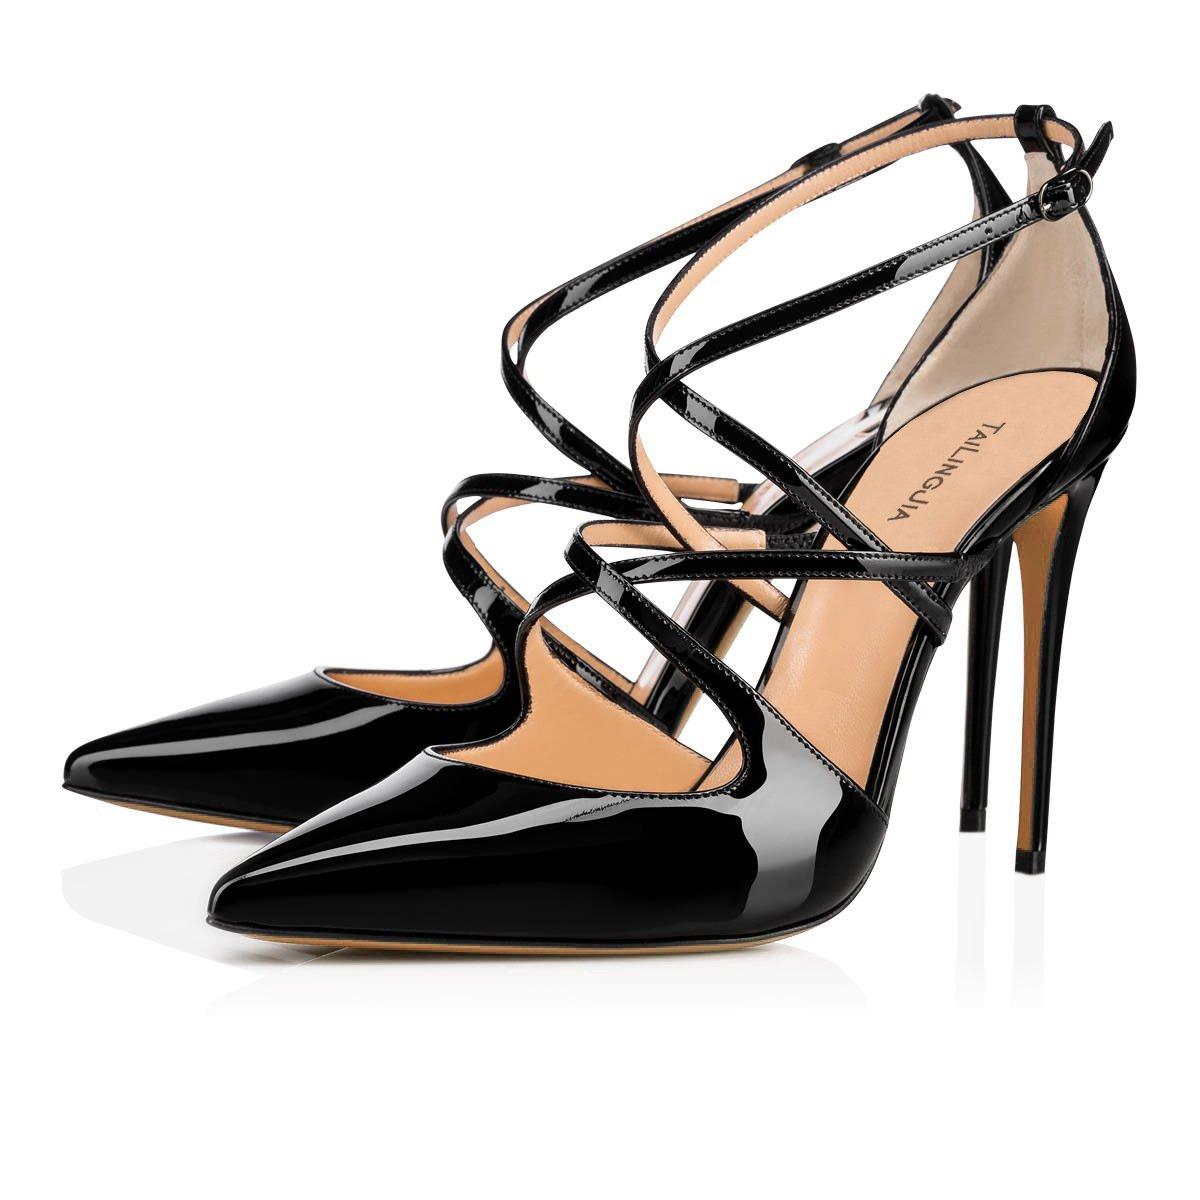 New Frauen Mode Sandalen 2018 Sommer neue Leder Pumps Platz High Heels Schnalle hohle Ankle Strap Sandalen eu size  36|Rosa